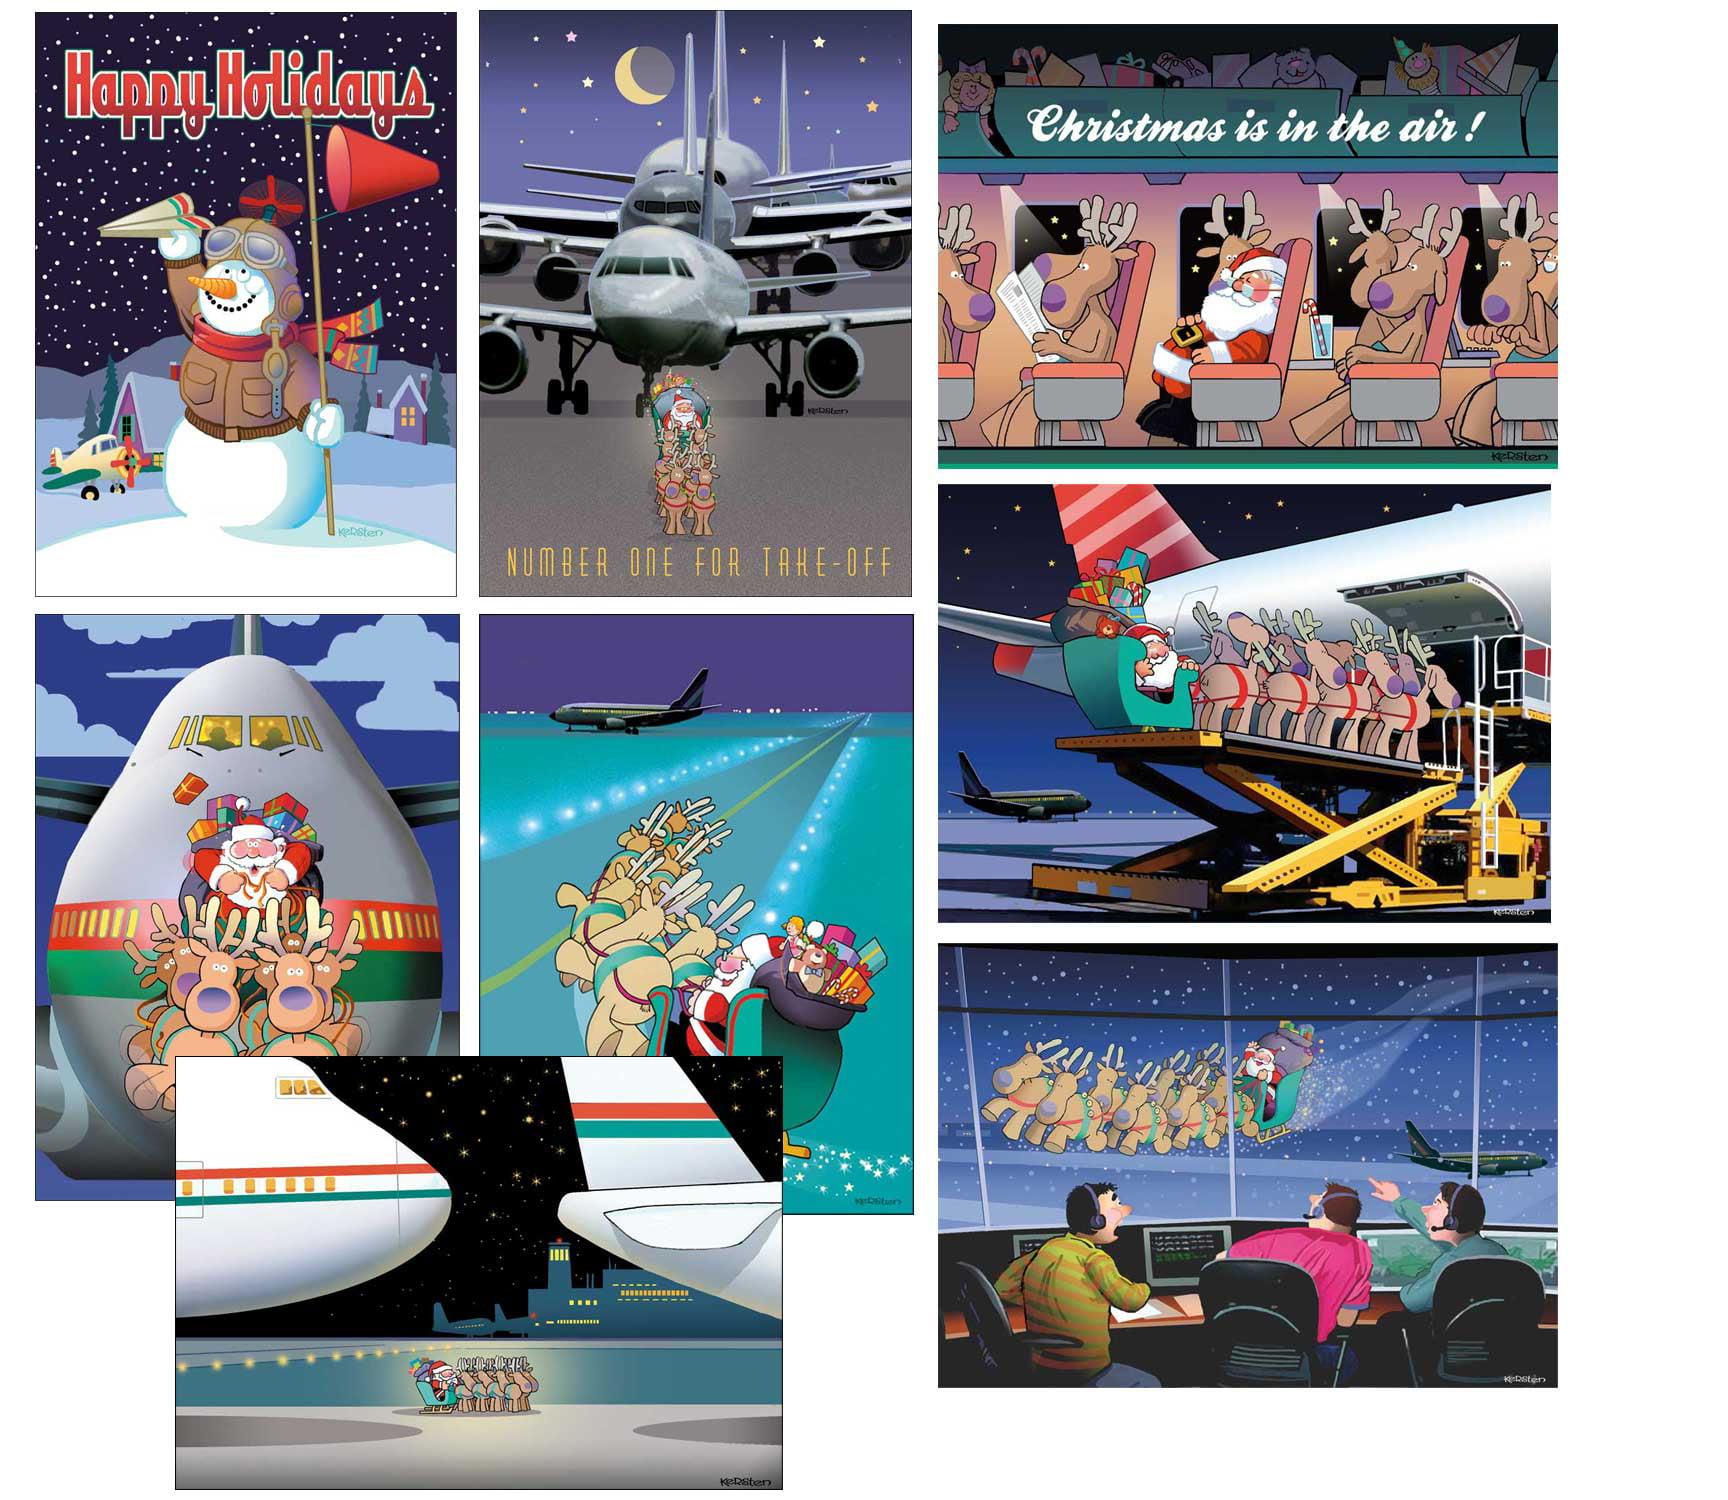 Airplane Christmas Card Variety Pack 24 Cards & Envelopes - Walmart.com